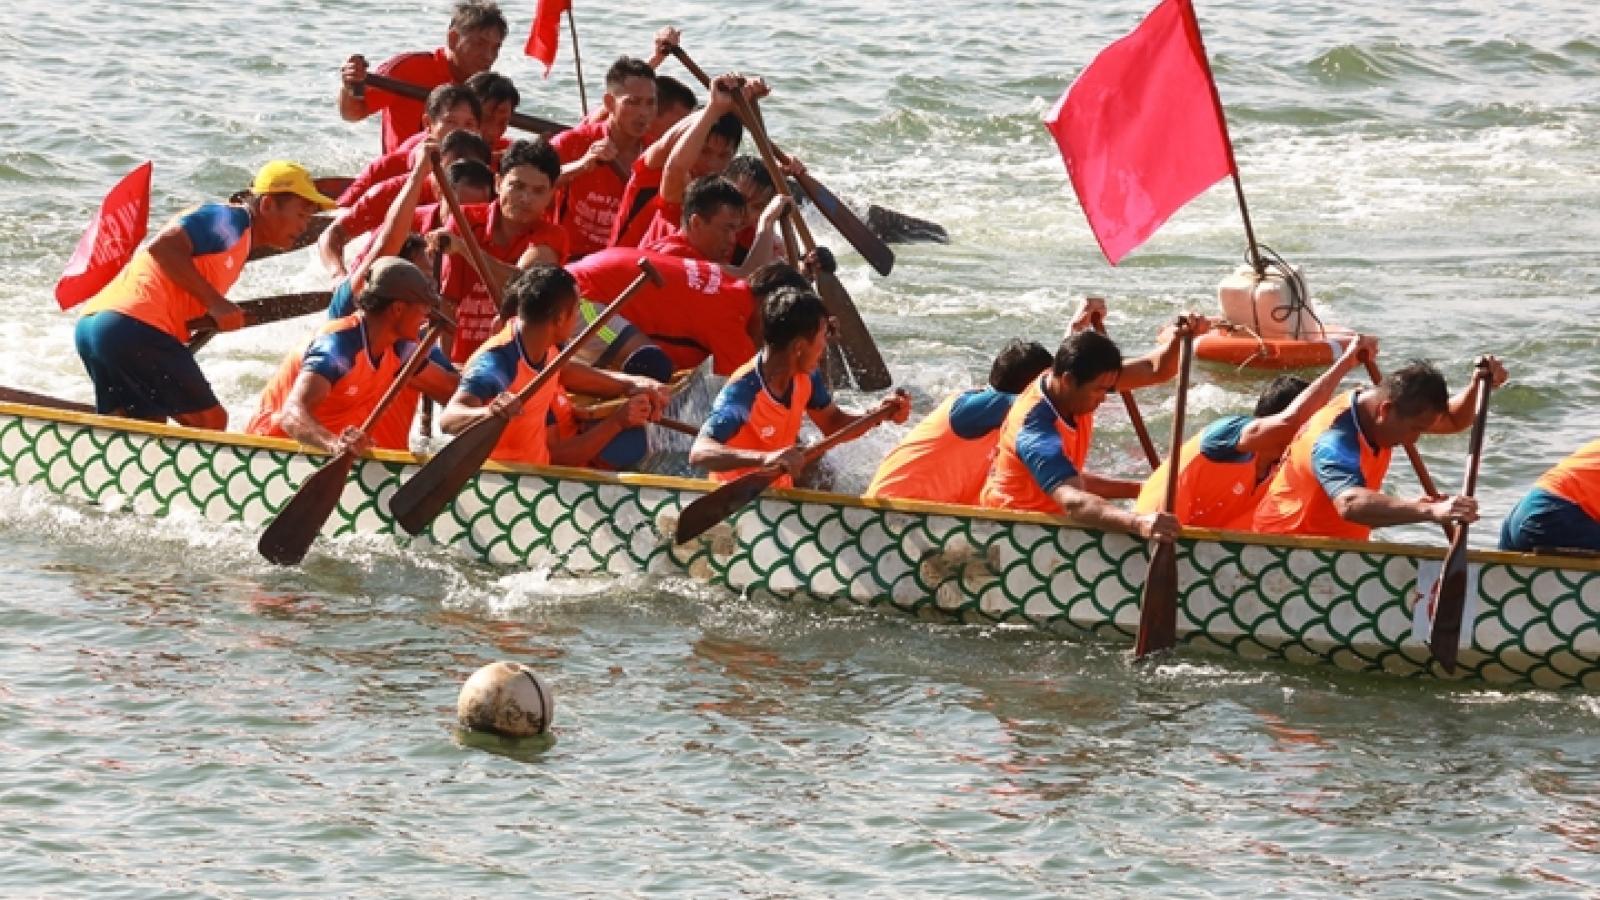 Boat race kicks off New Year in Danang